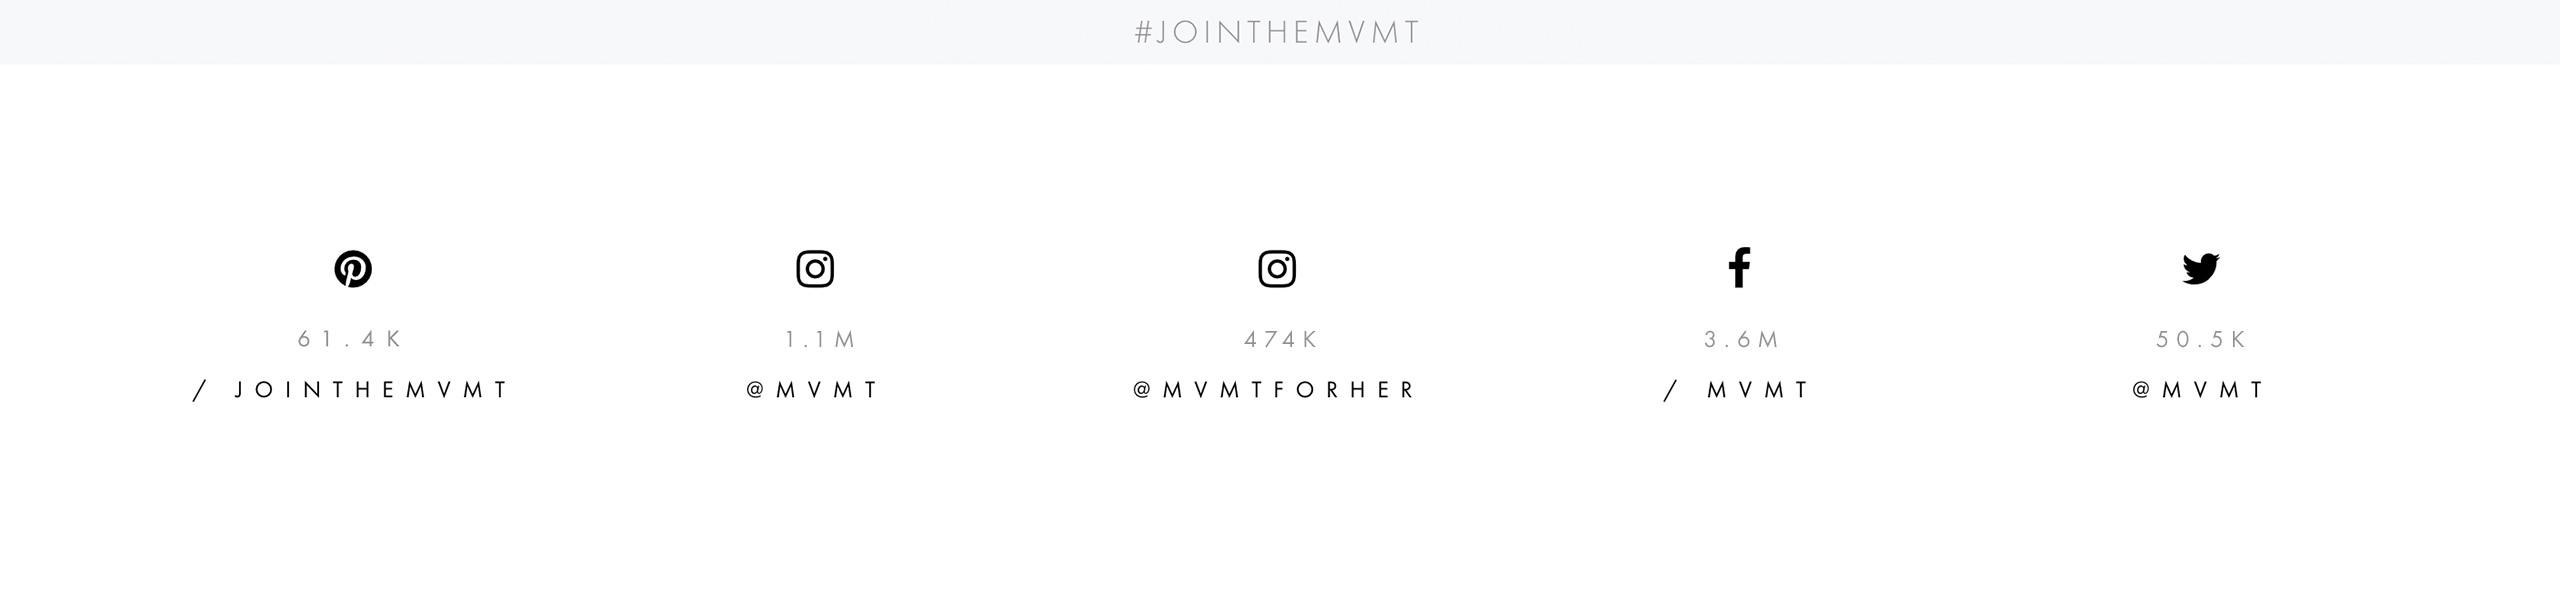 #jointhemvmt. 61.4K /jointhemvmt. 1.1M @mvmt/ 474K @mvmtforher. 3.6M /MVMT. 50.5K @mvmt